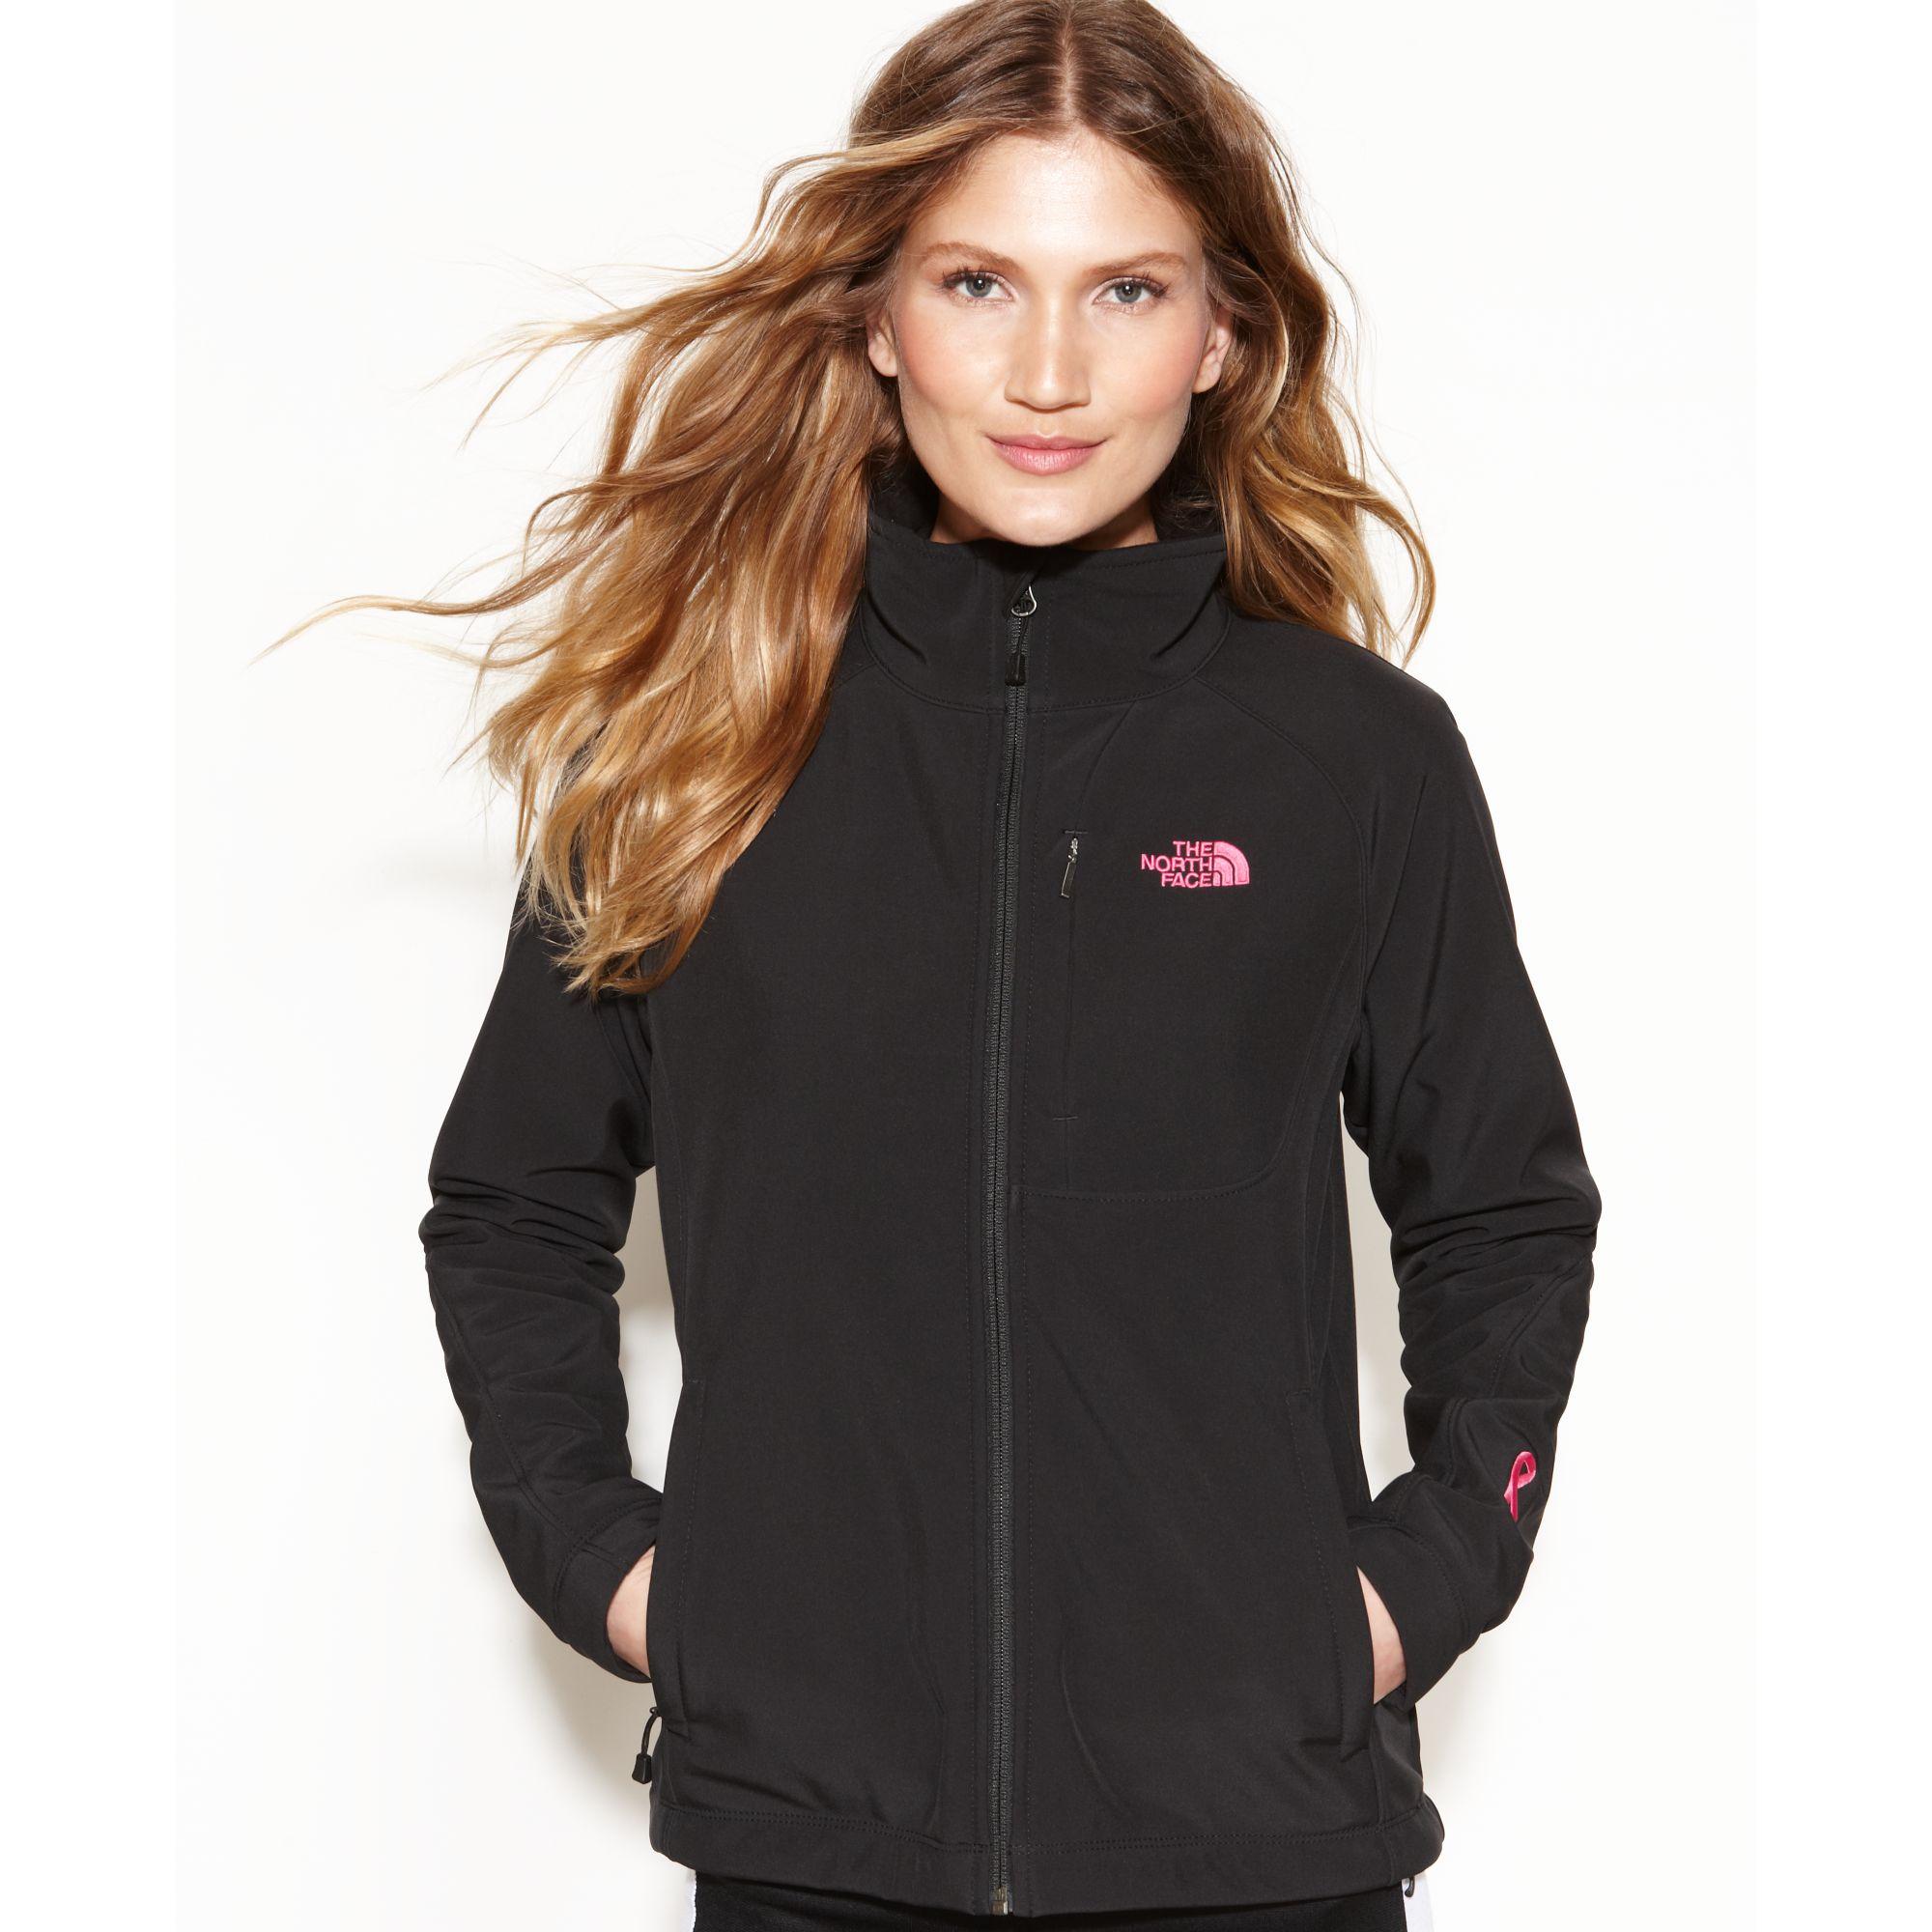 Apex bionic womens jacket